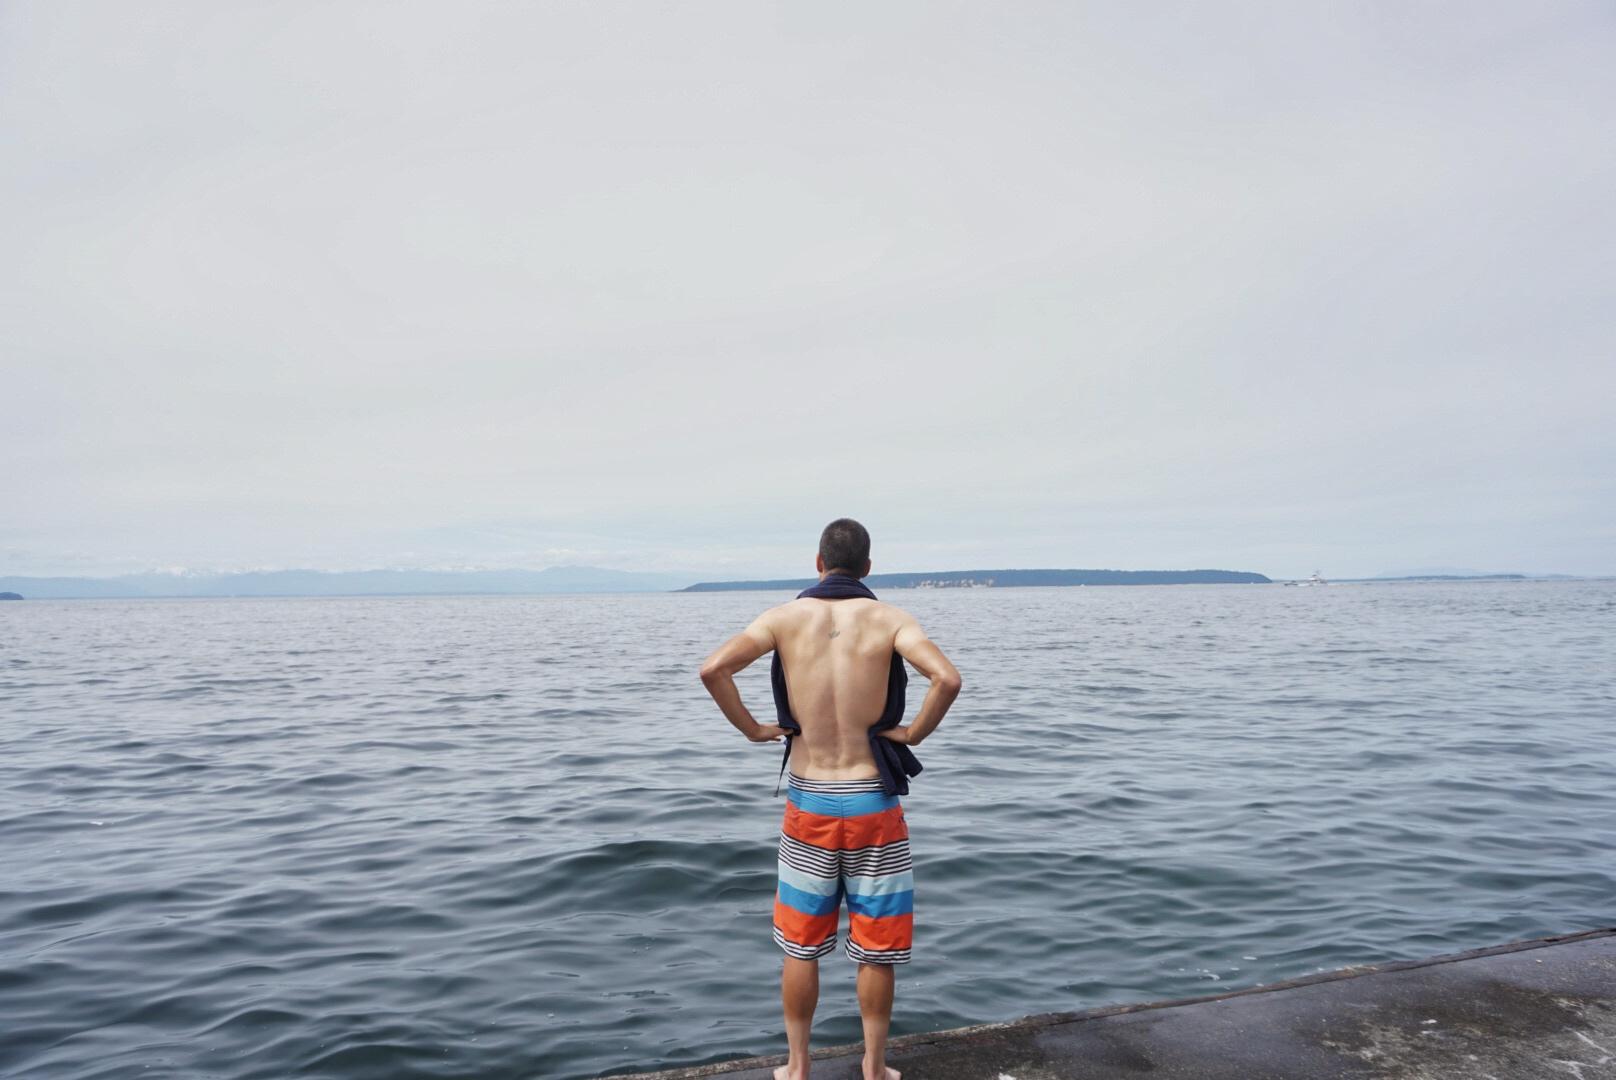 Post race ocean swim!